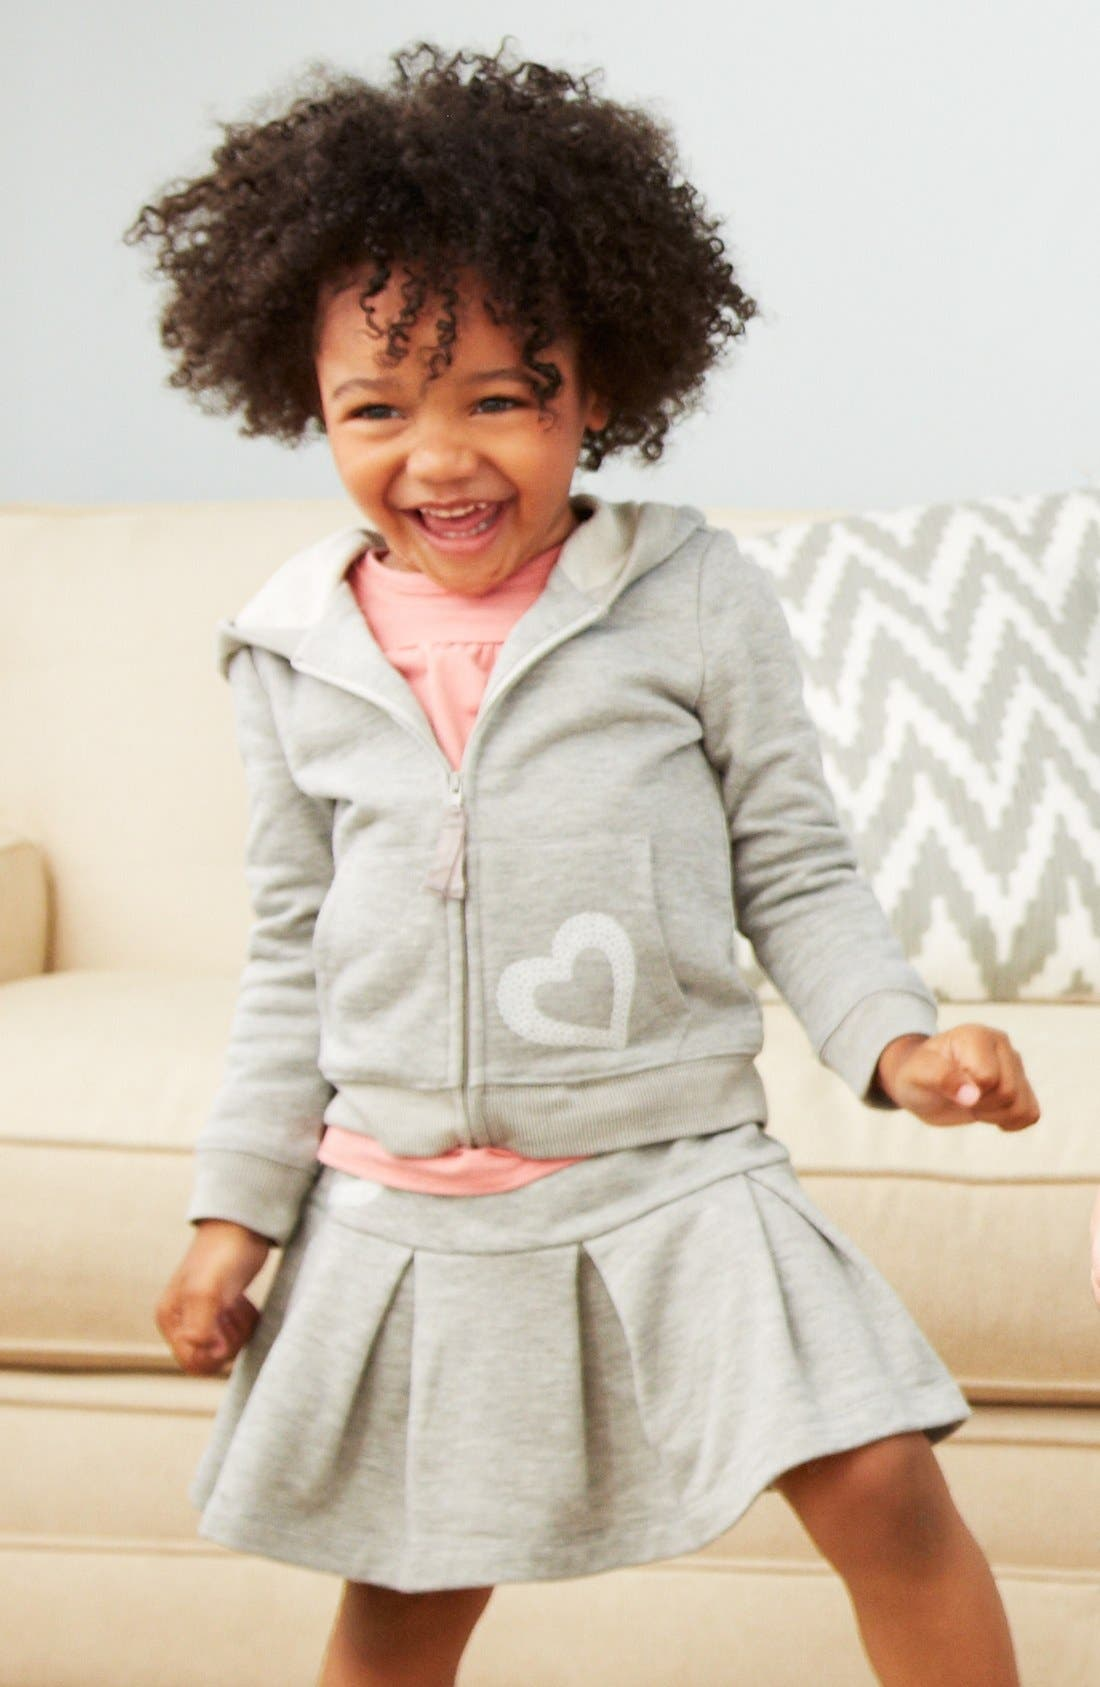 Main Image - Design History Hoodie & Skirt, Tucker + Tate Top (Toddler Girls)